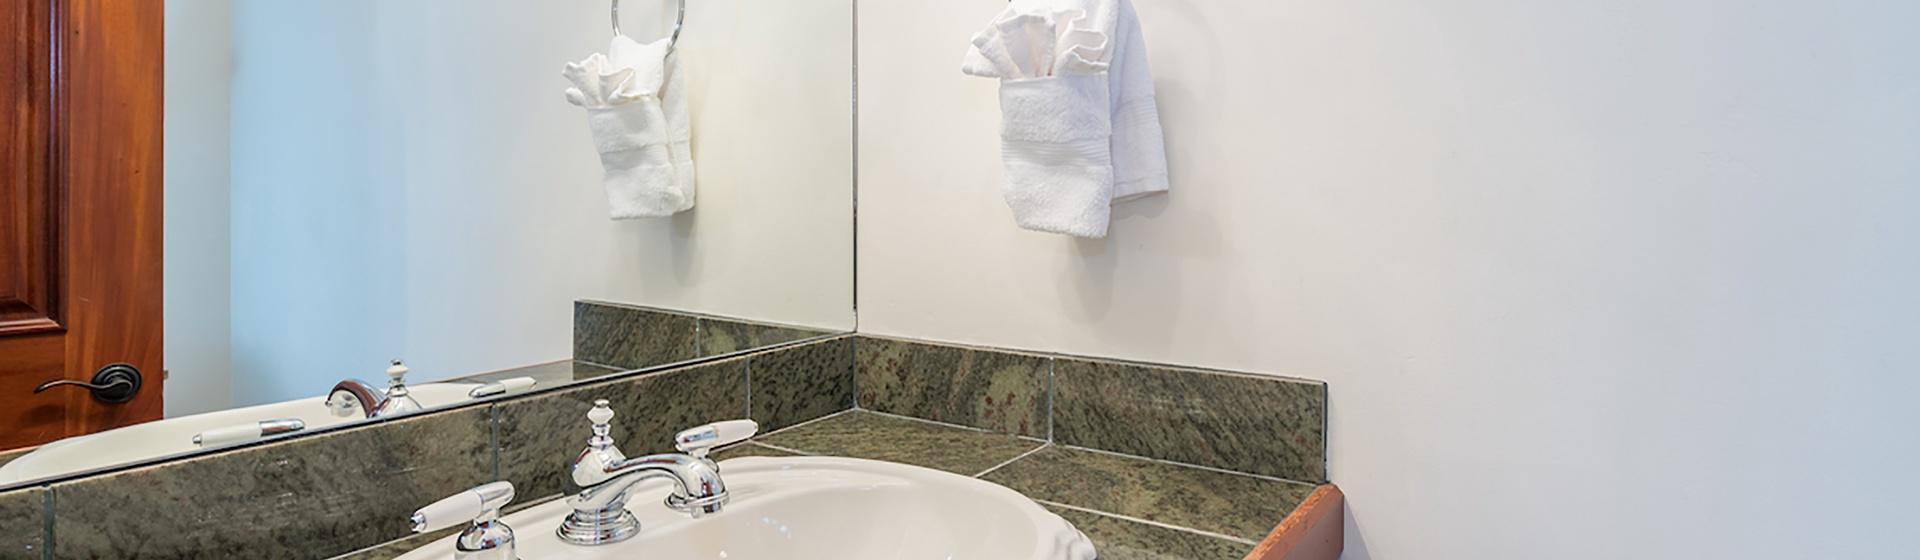 2.08--telluride-south-pacific-new-half-bathroom-v12-Web.jpg